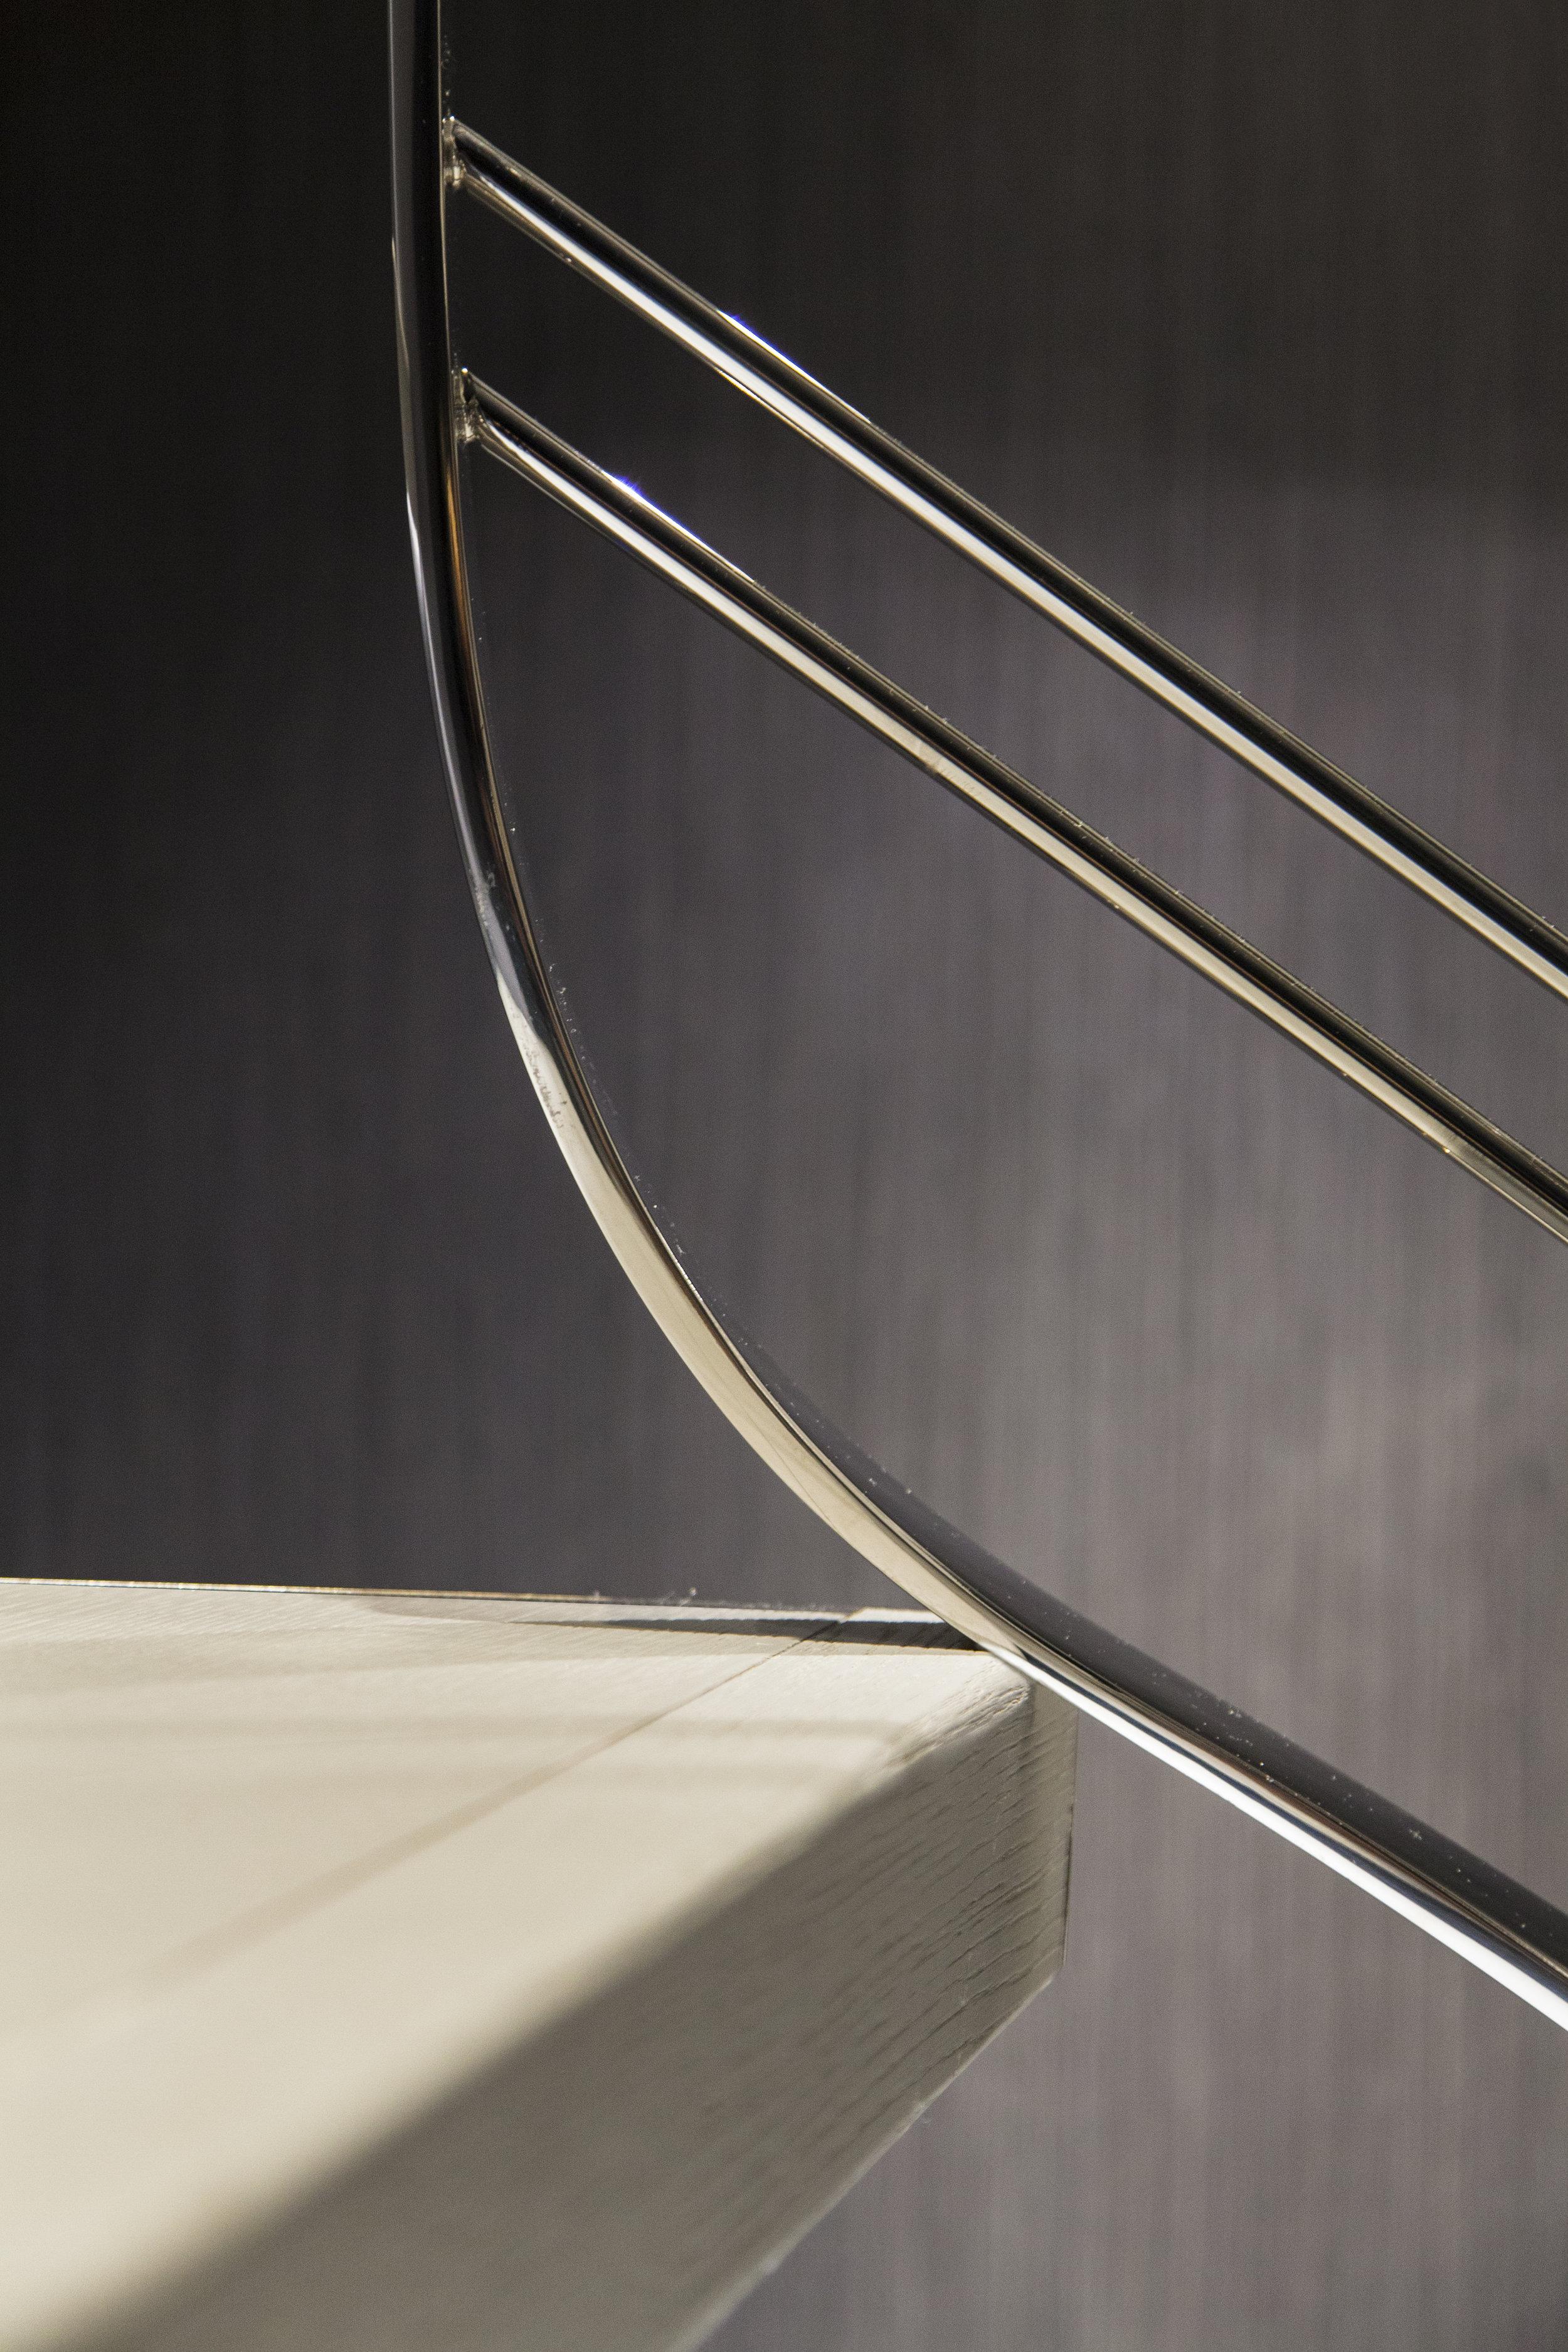 DOMINATOR ILUMEN 28M - CADET V - INTERIOR DESIGN AND PHOTO BY LUCA CATINO (9).jpg